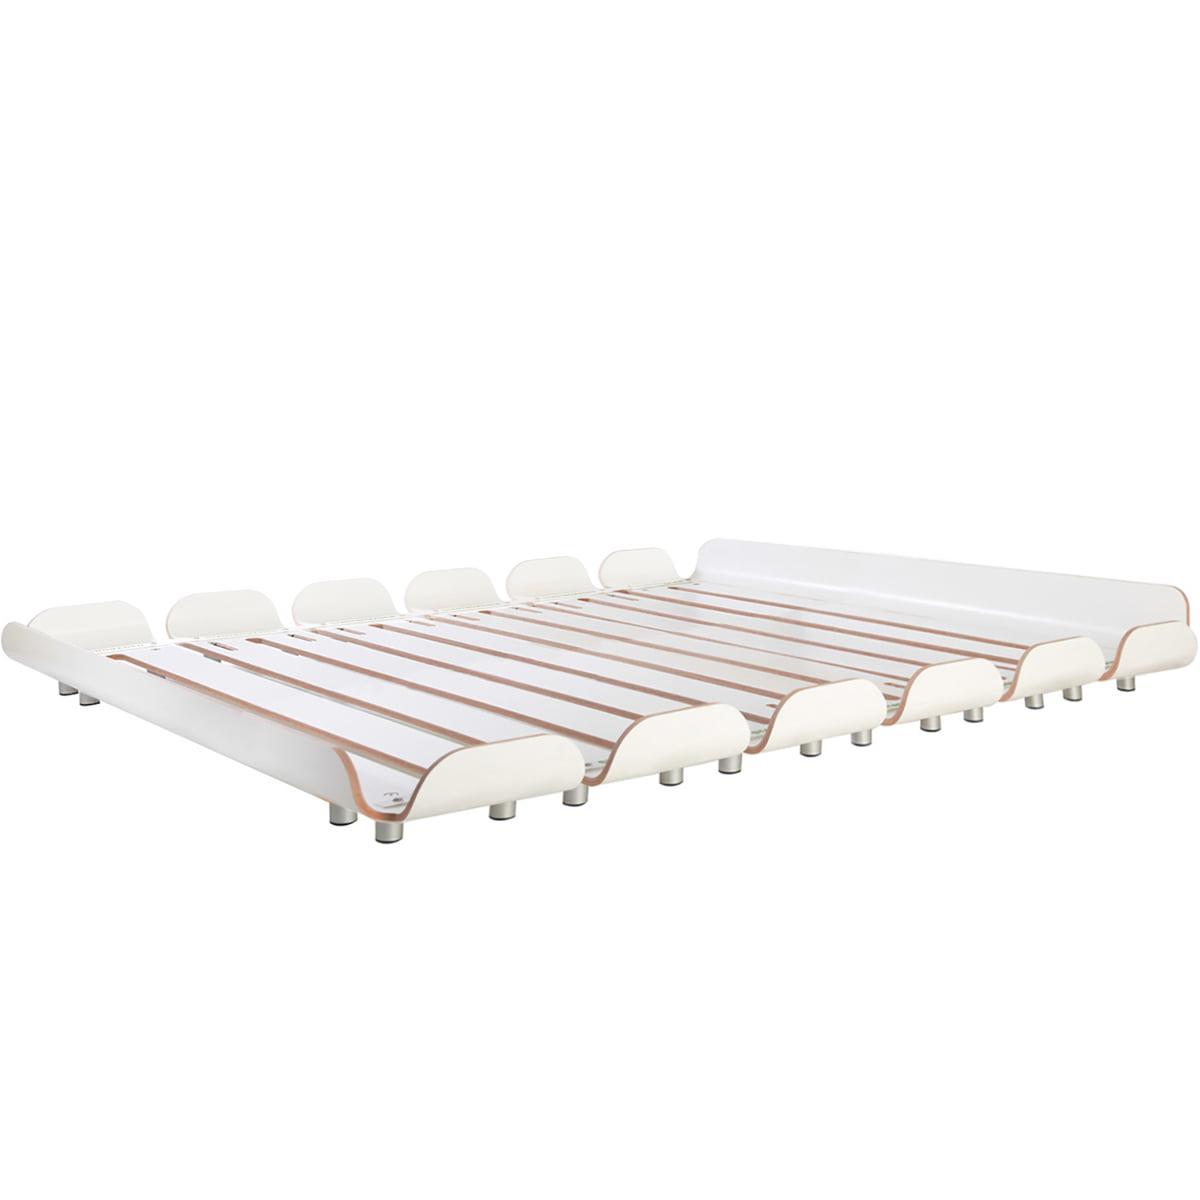 stadtnomaden tiefschlaf bett 160 cm wei wei t 160 h. Black Bedroom Furniture Sets. Home Design Ideas